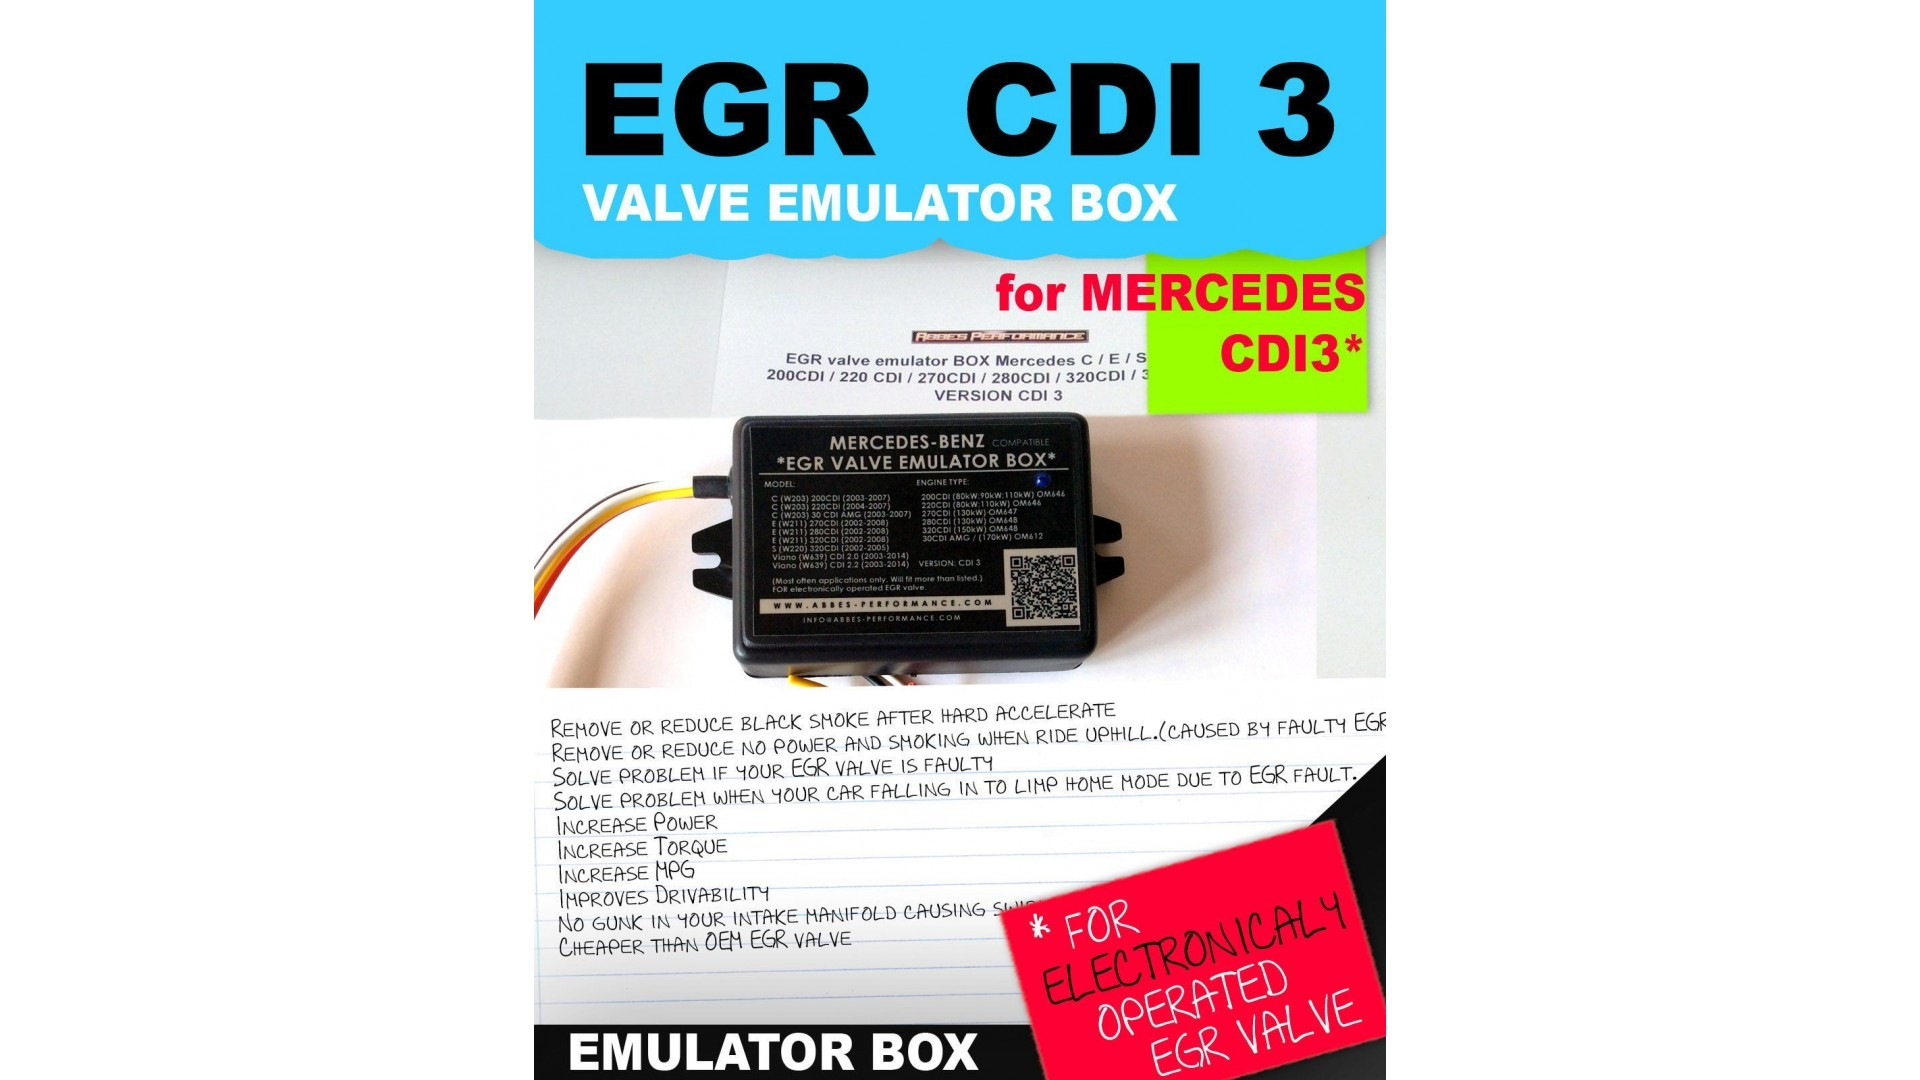 egr valve emulator box mercedes c e s ml 400 cdi. Black Bedroom Furniture Sets. Home Design Ideas